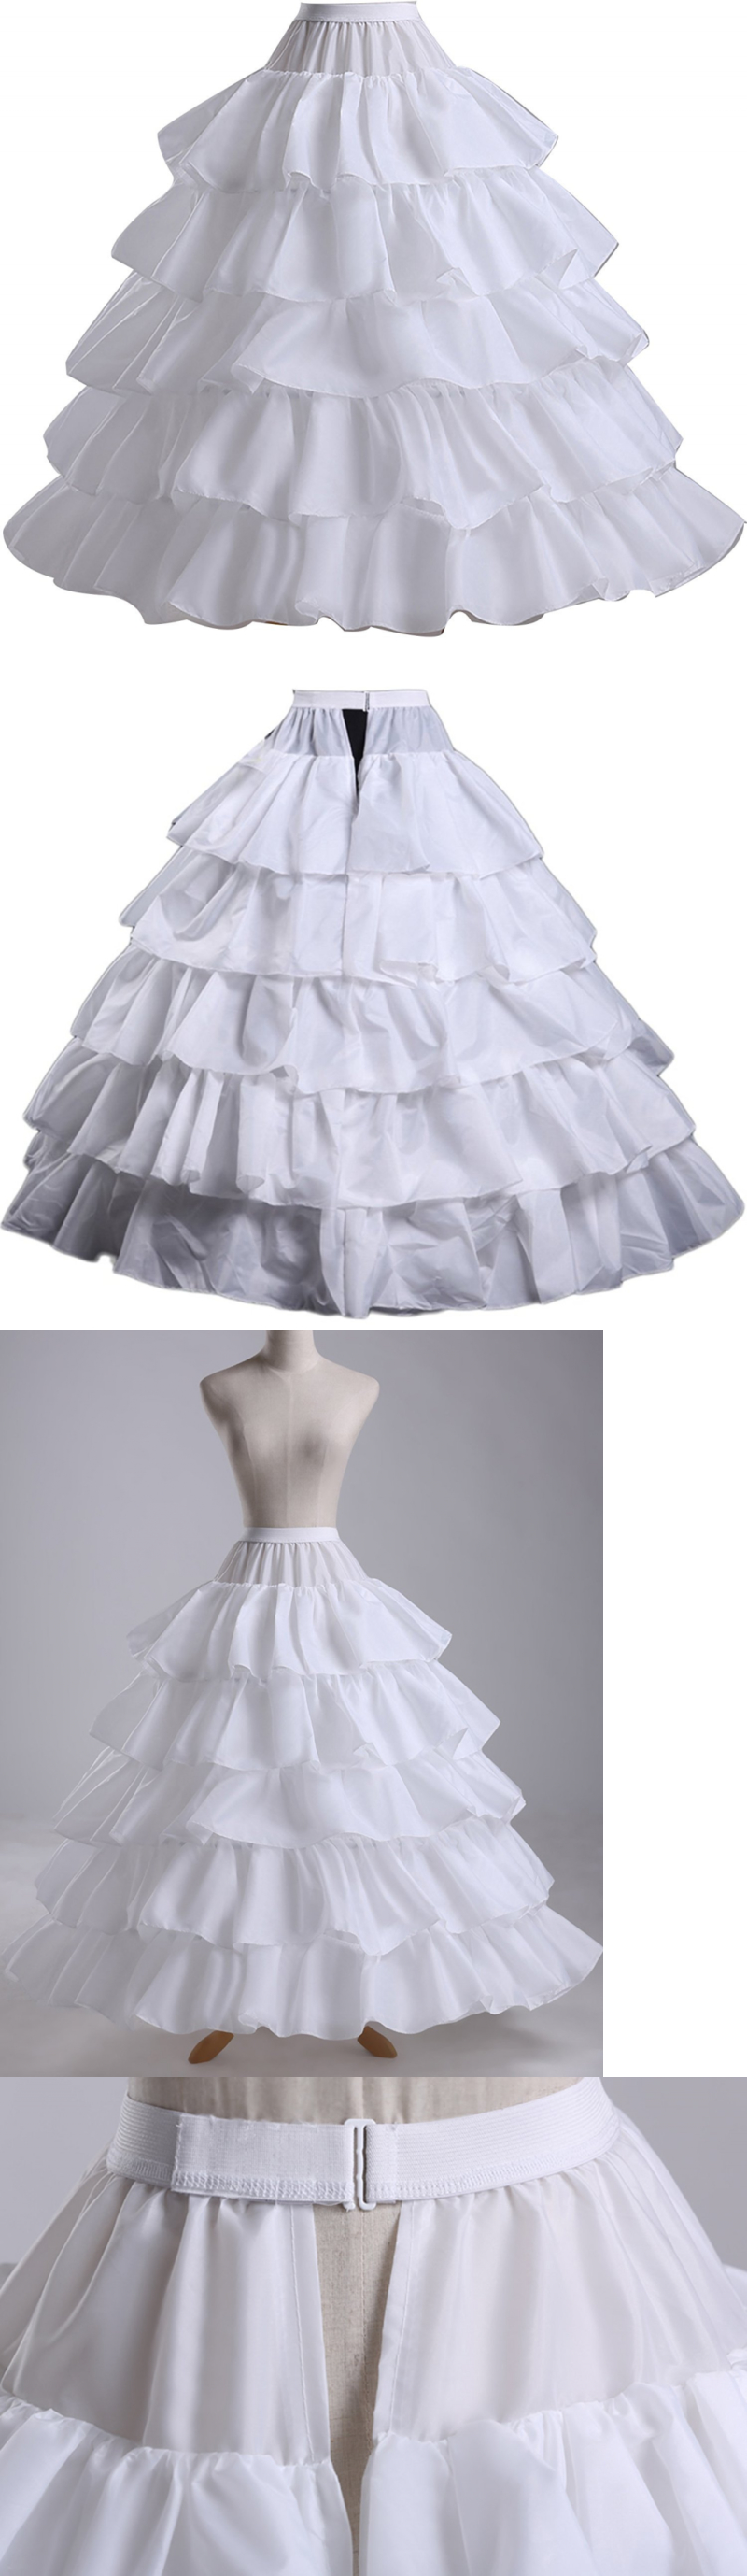 Slips Petticoats and Hoops 98745: Wantdo Women S Wedding Gown Bridal ...